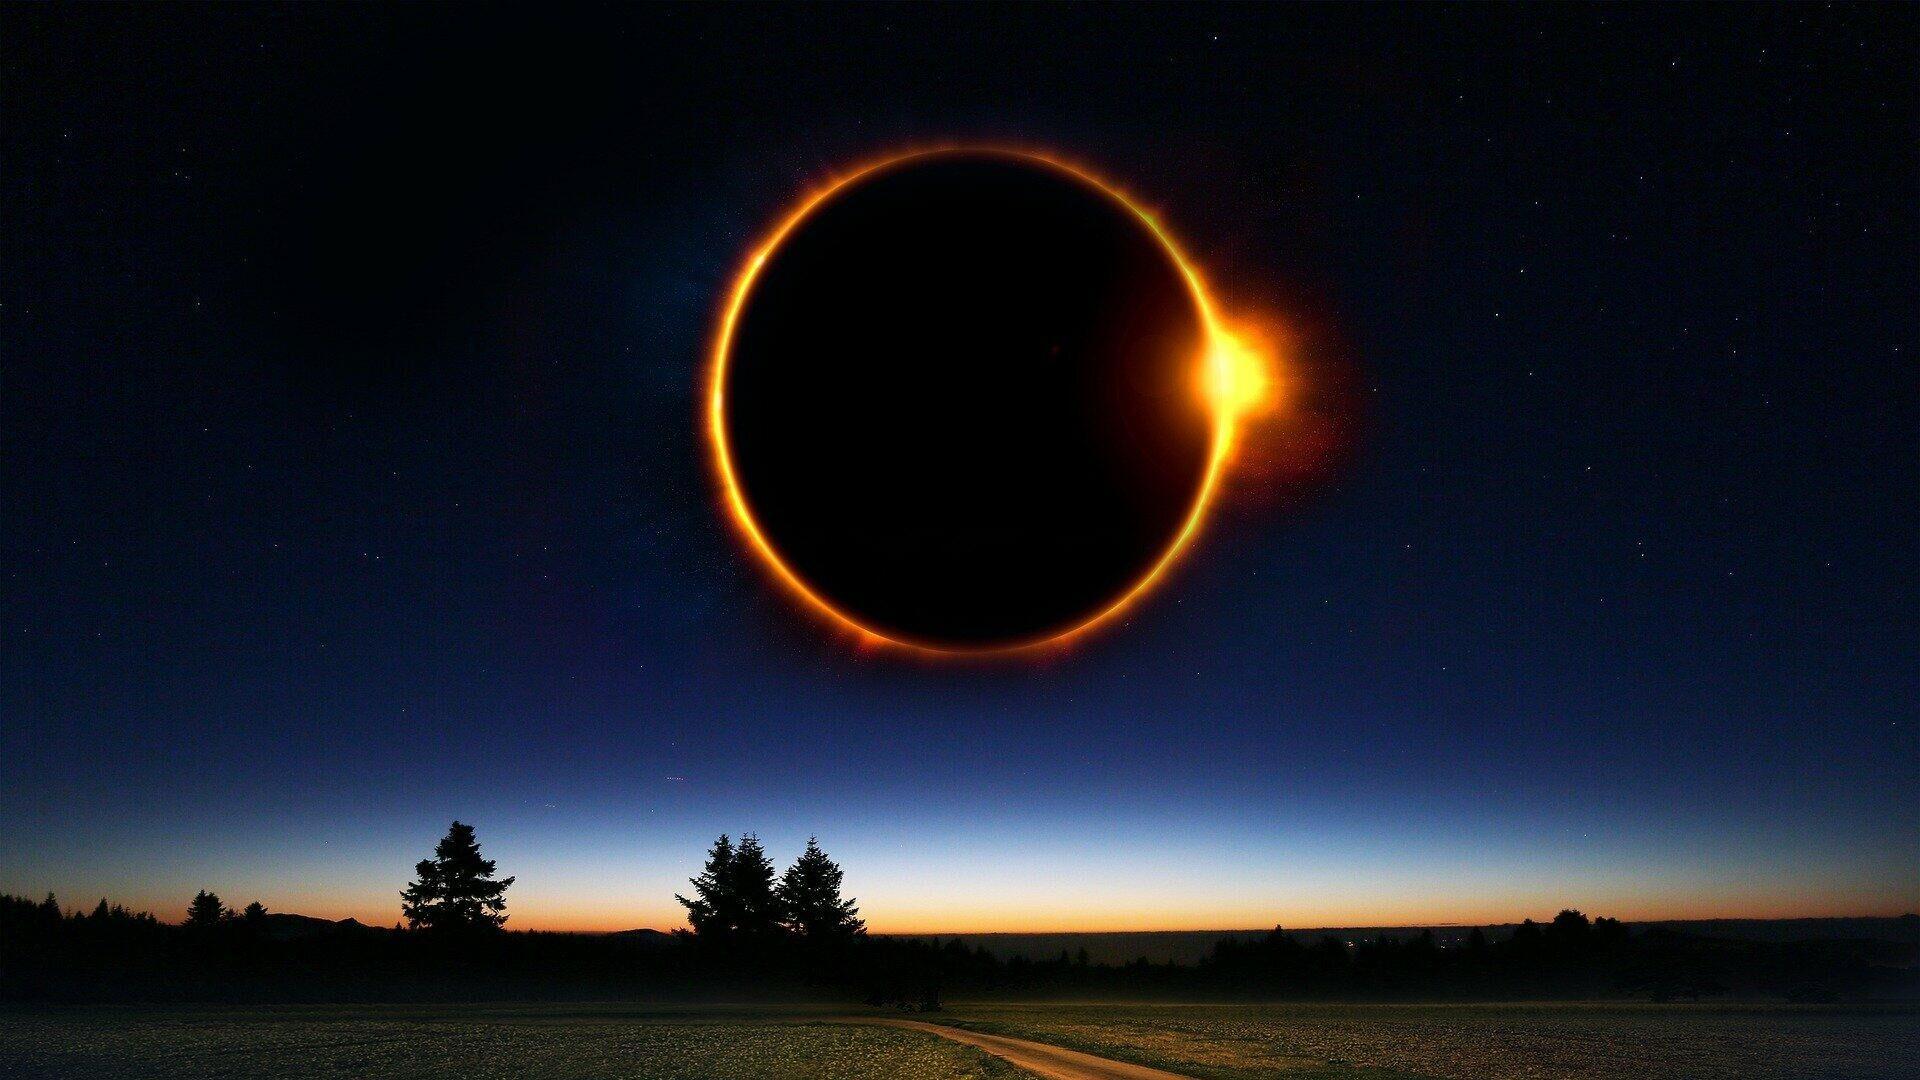 Eclipse sola (imagen referencial) - Sputnik Mundo, 1920, 09.06.2021